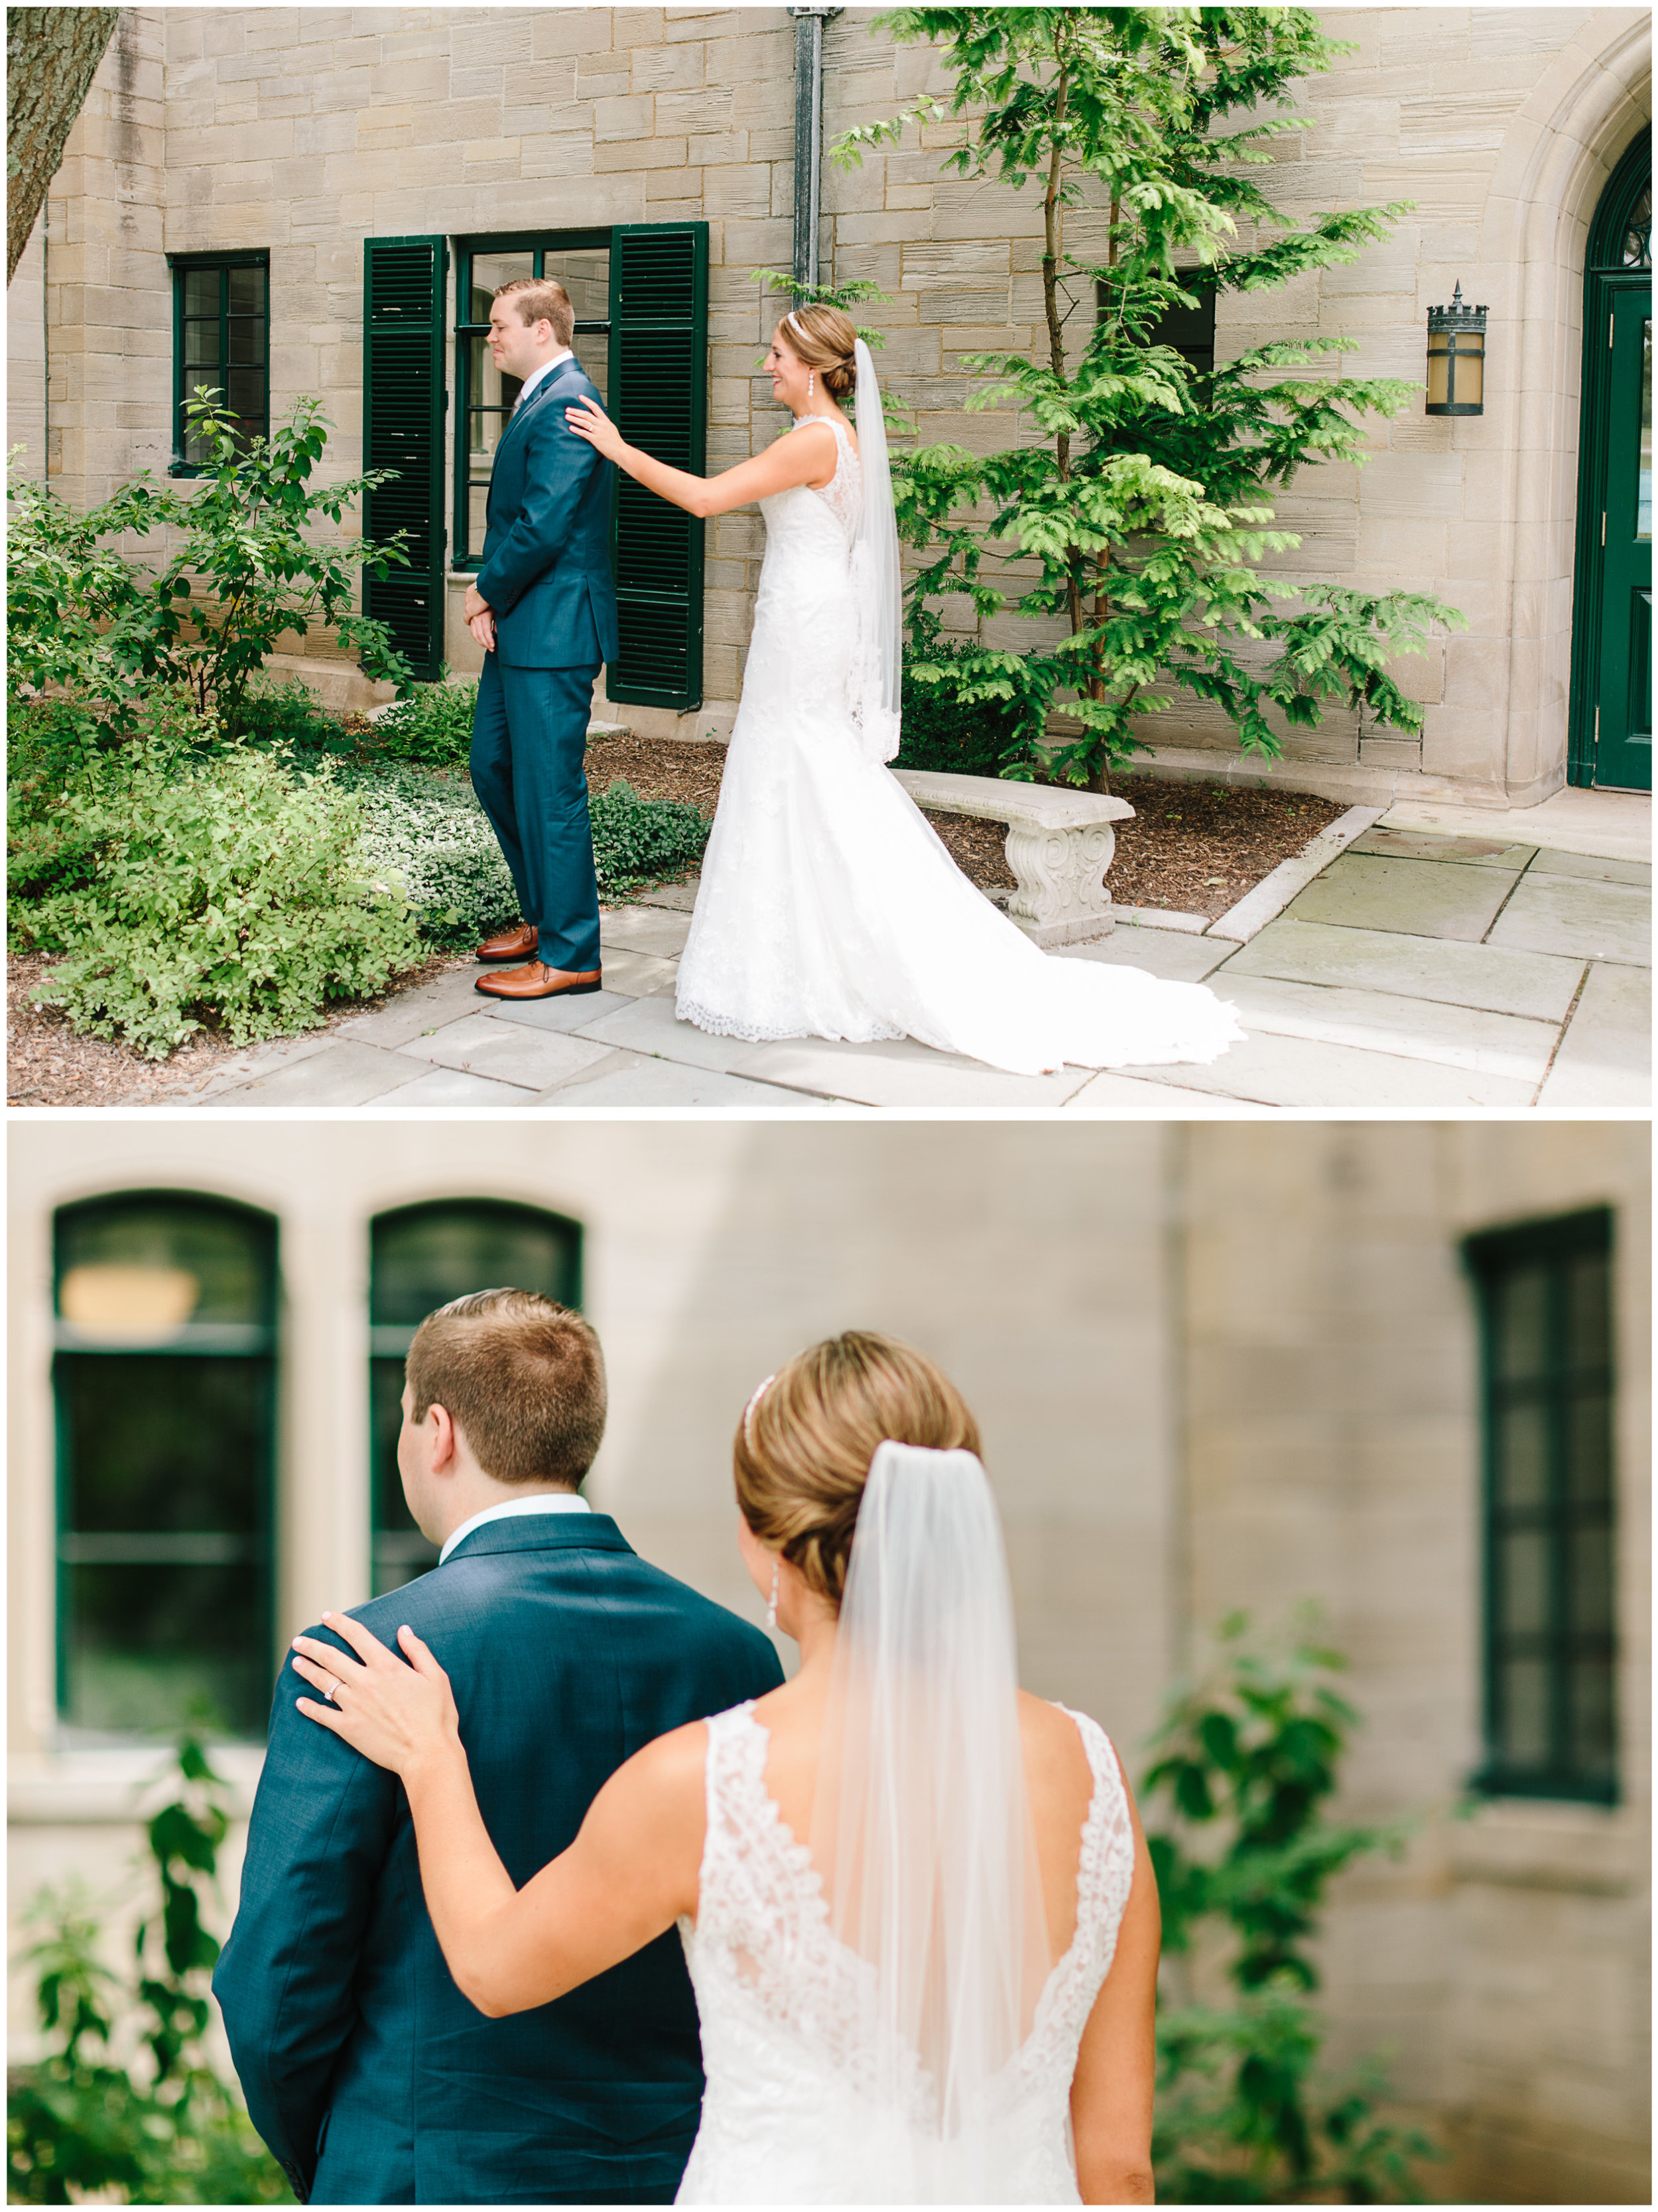 ann_arbor_michigan_wedding_32.jpg